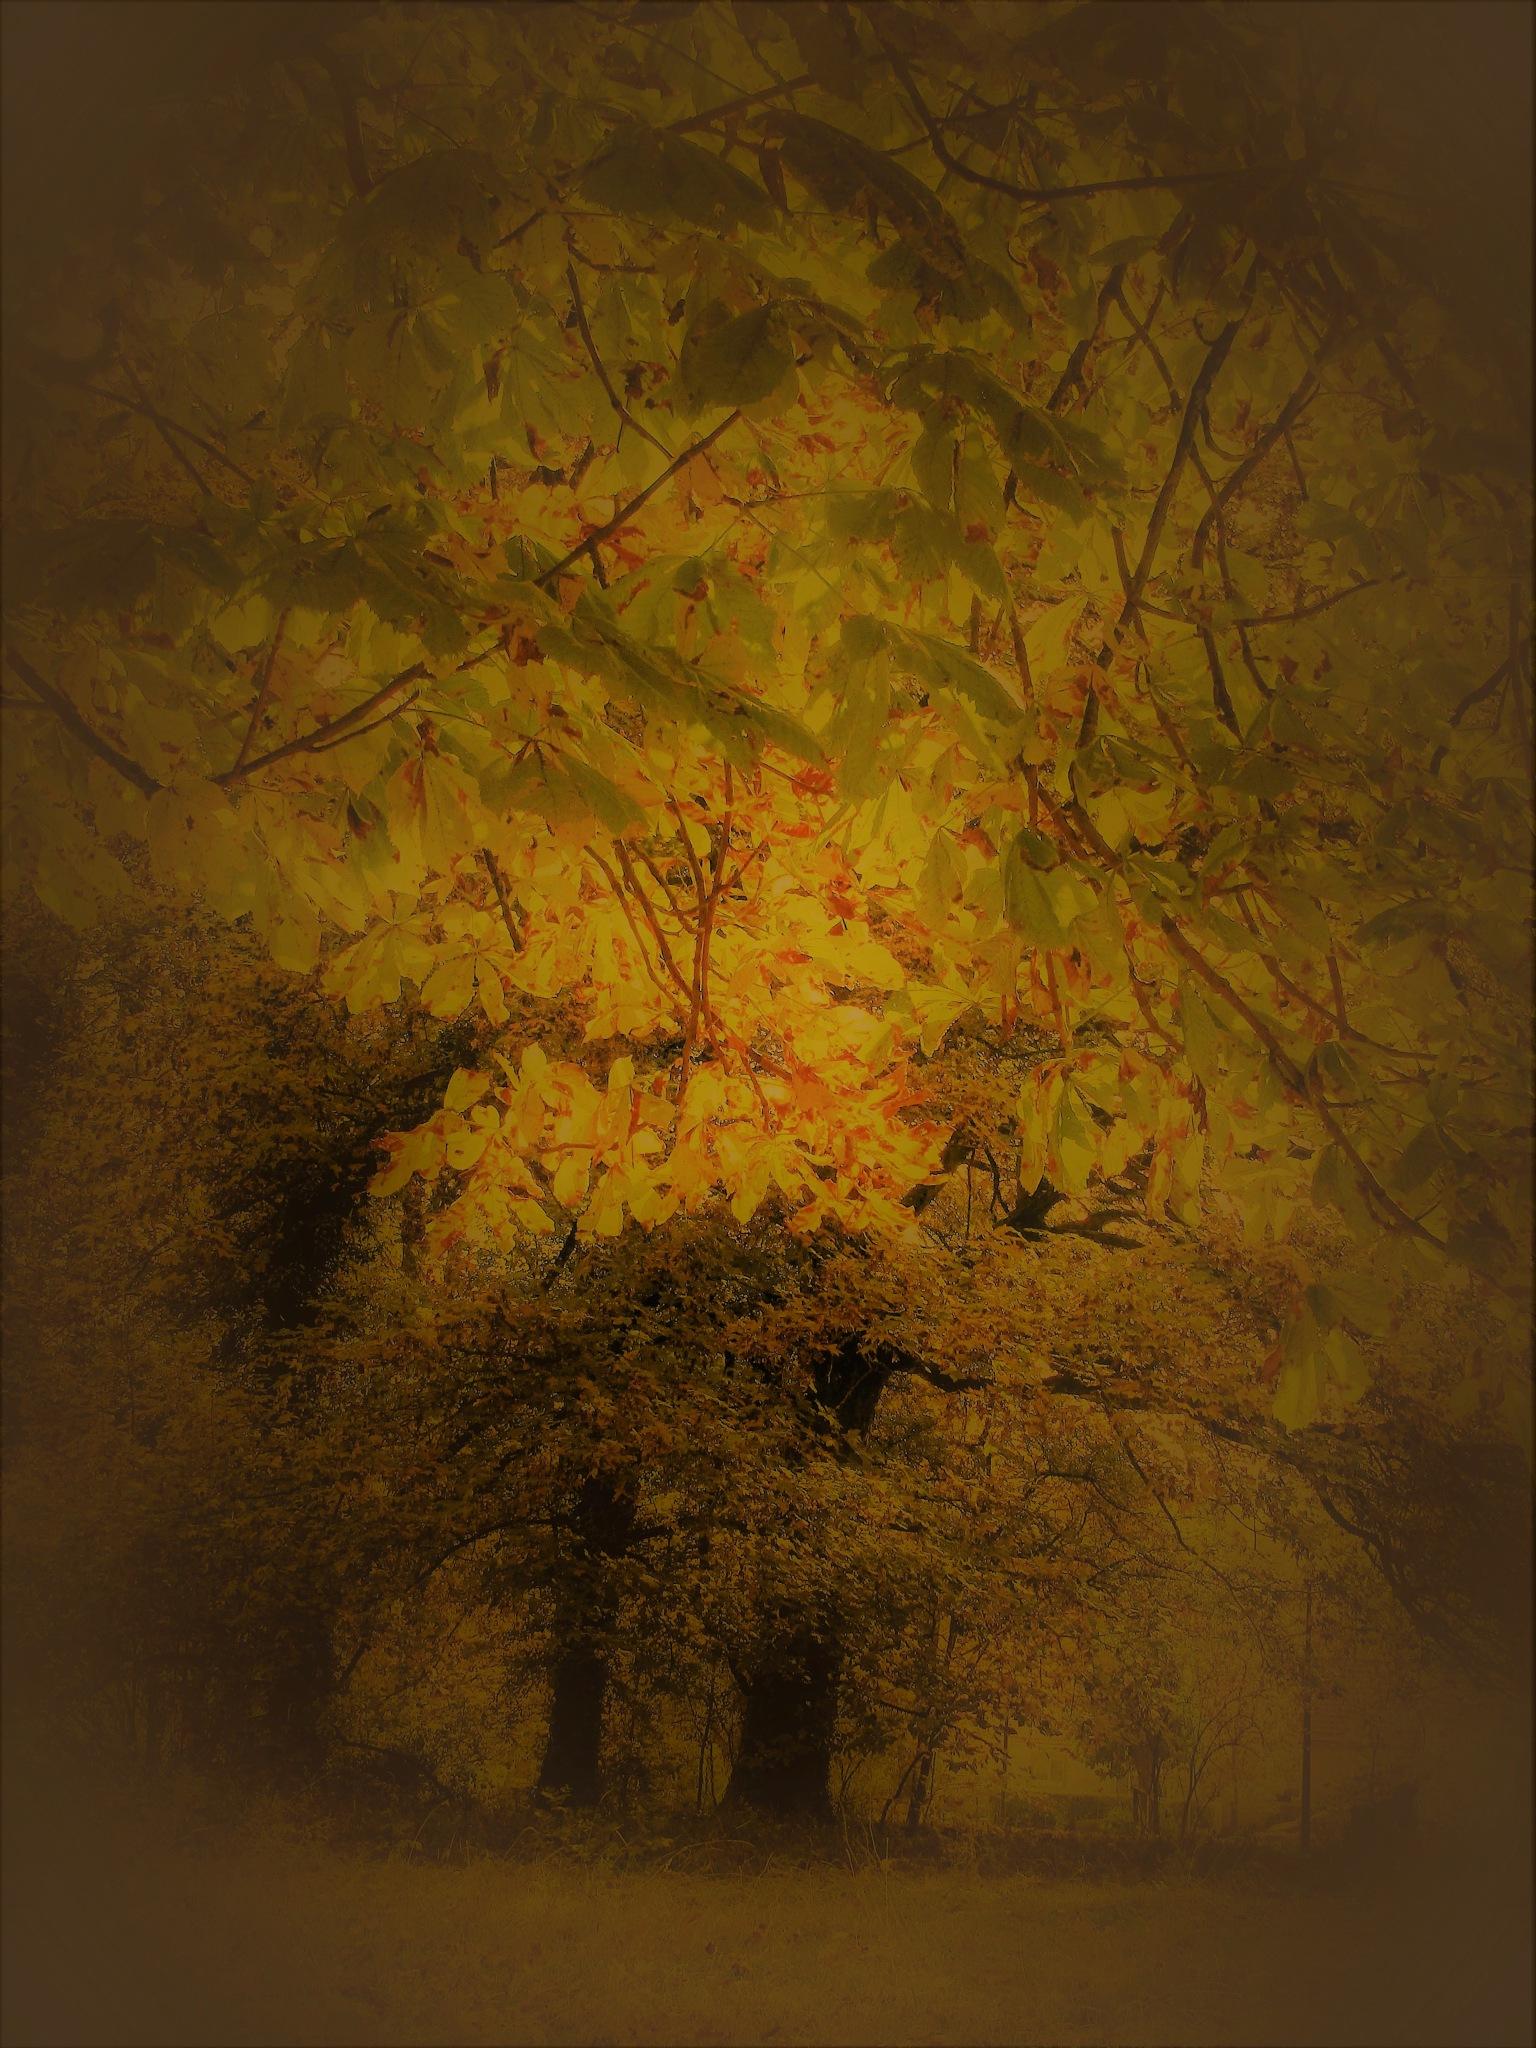 mirage by catherinevigili